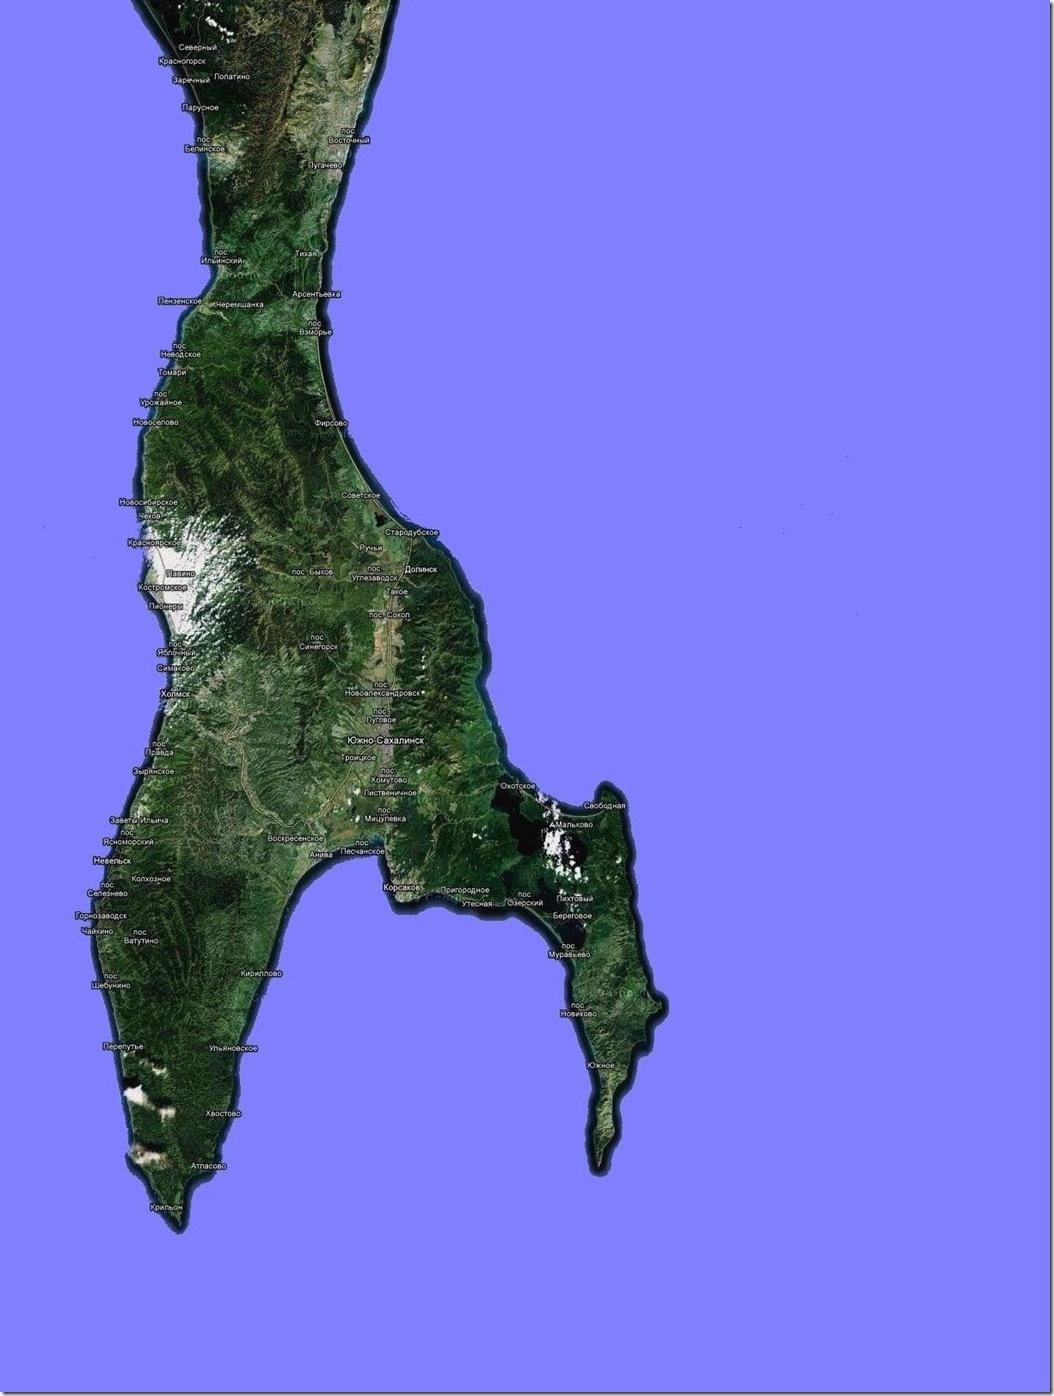 остров сахалин,island,sakhaln,sahalin,sahallin